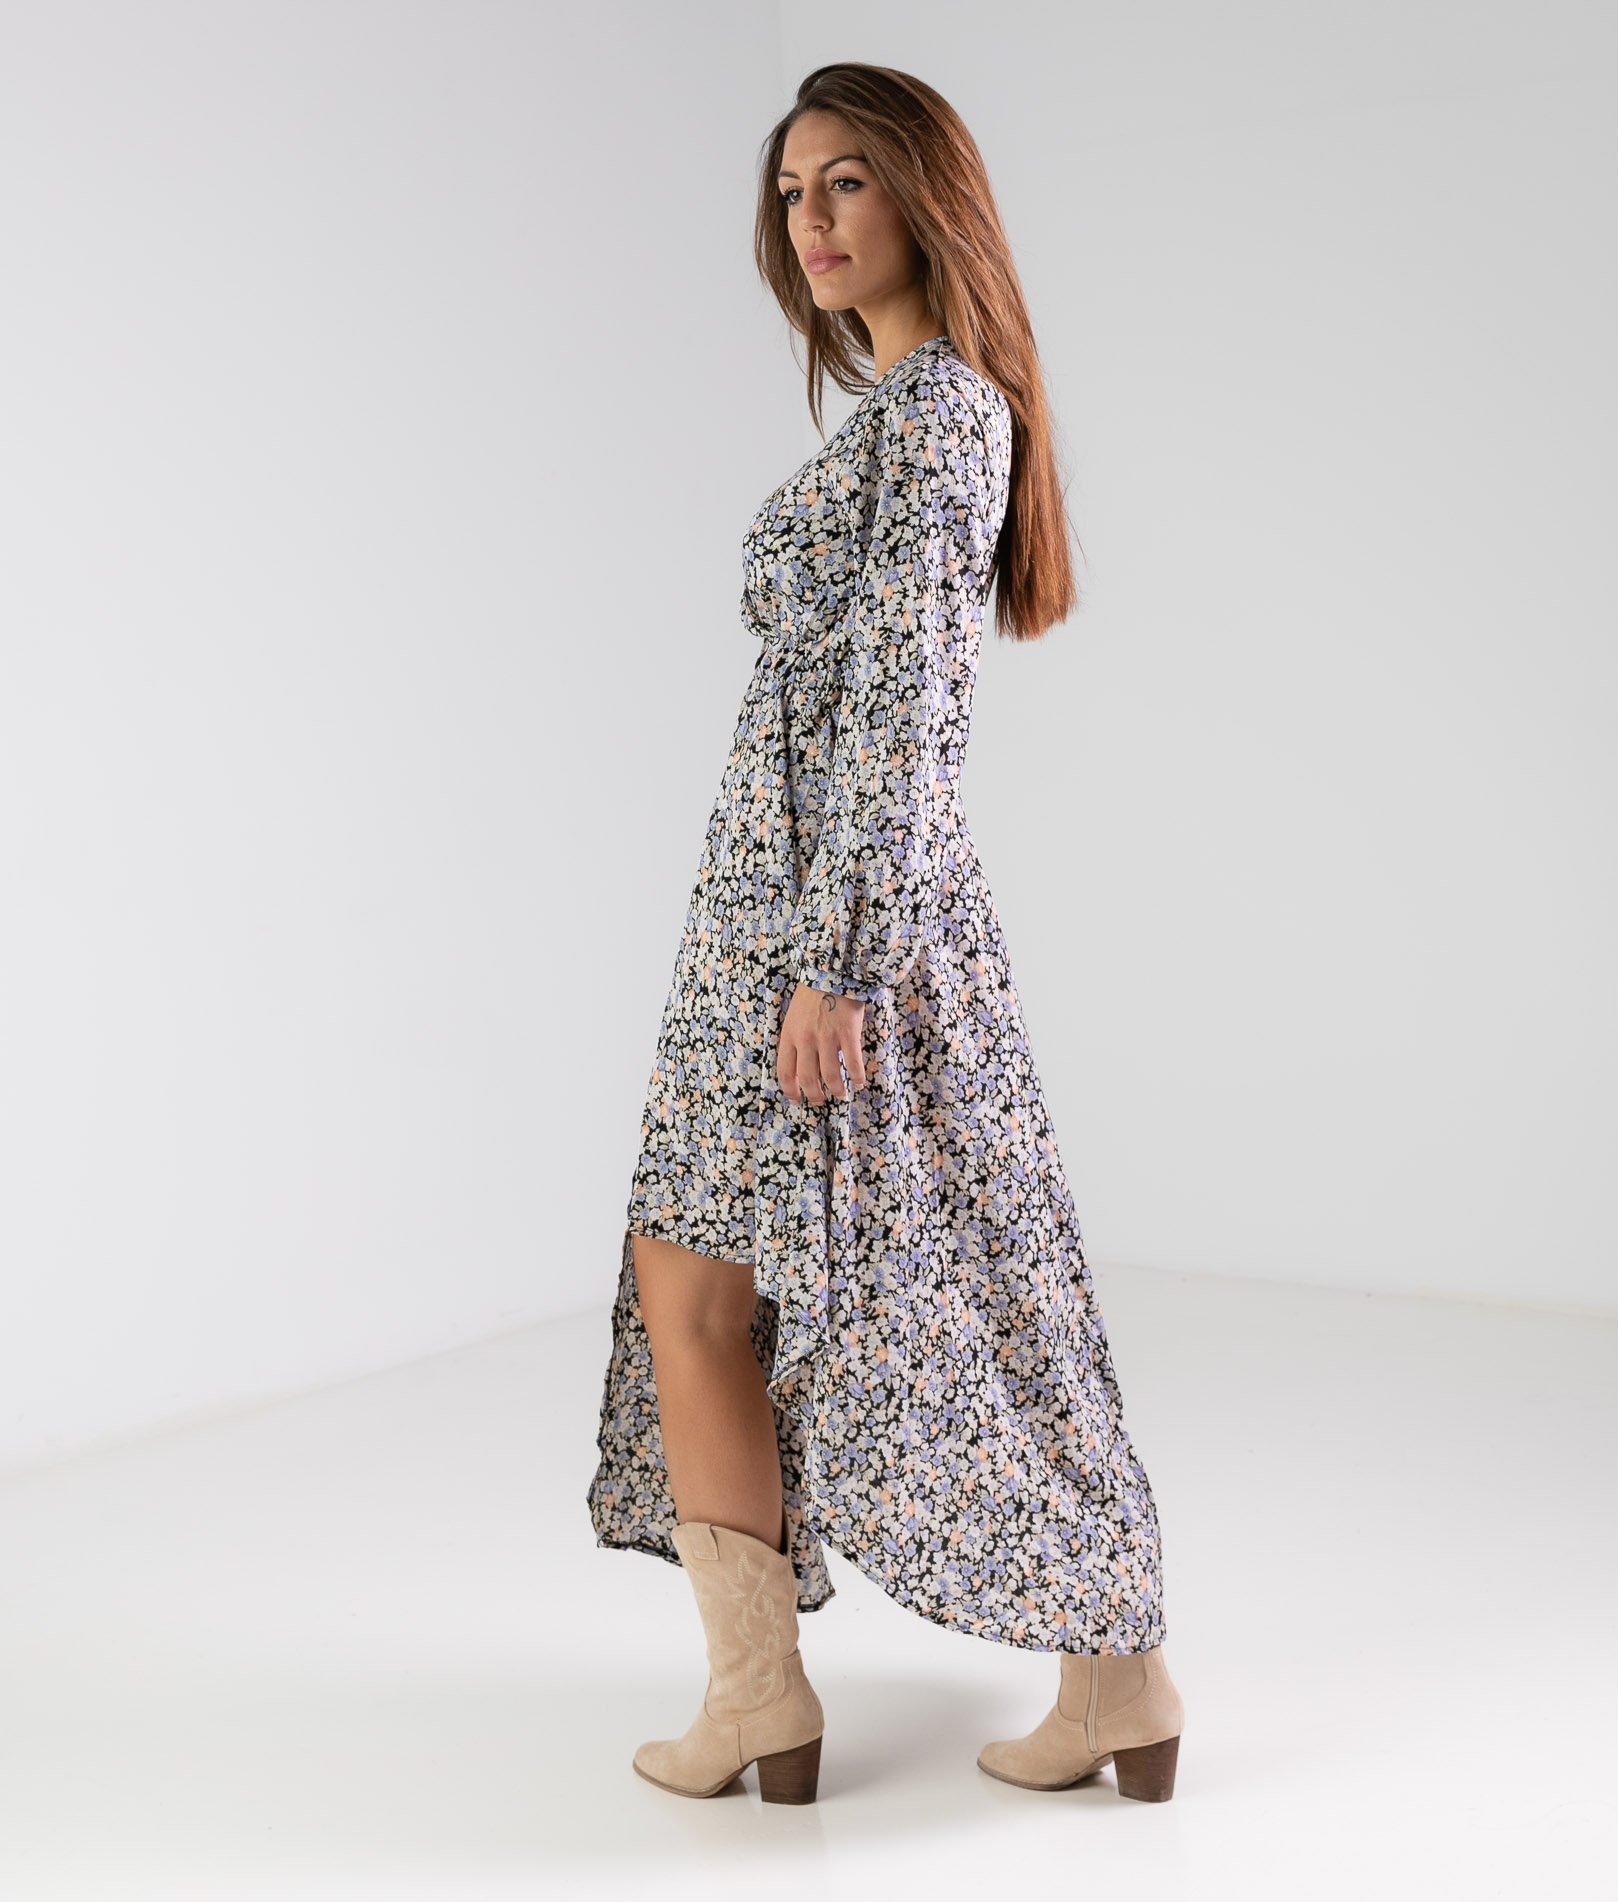 HAMBOTA DRESS - BLUE